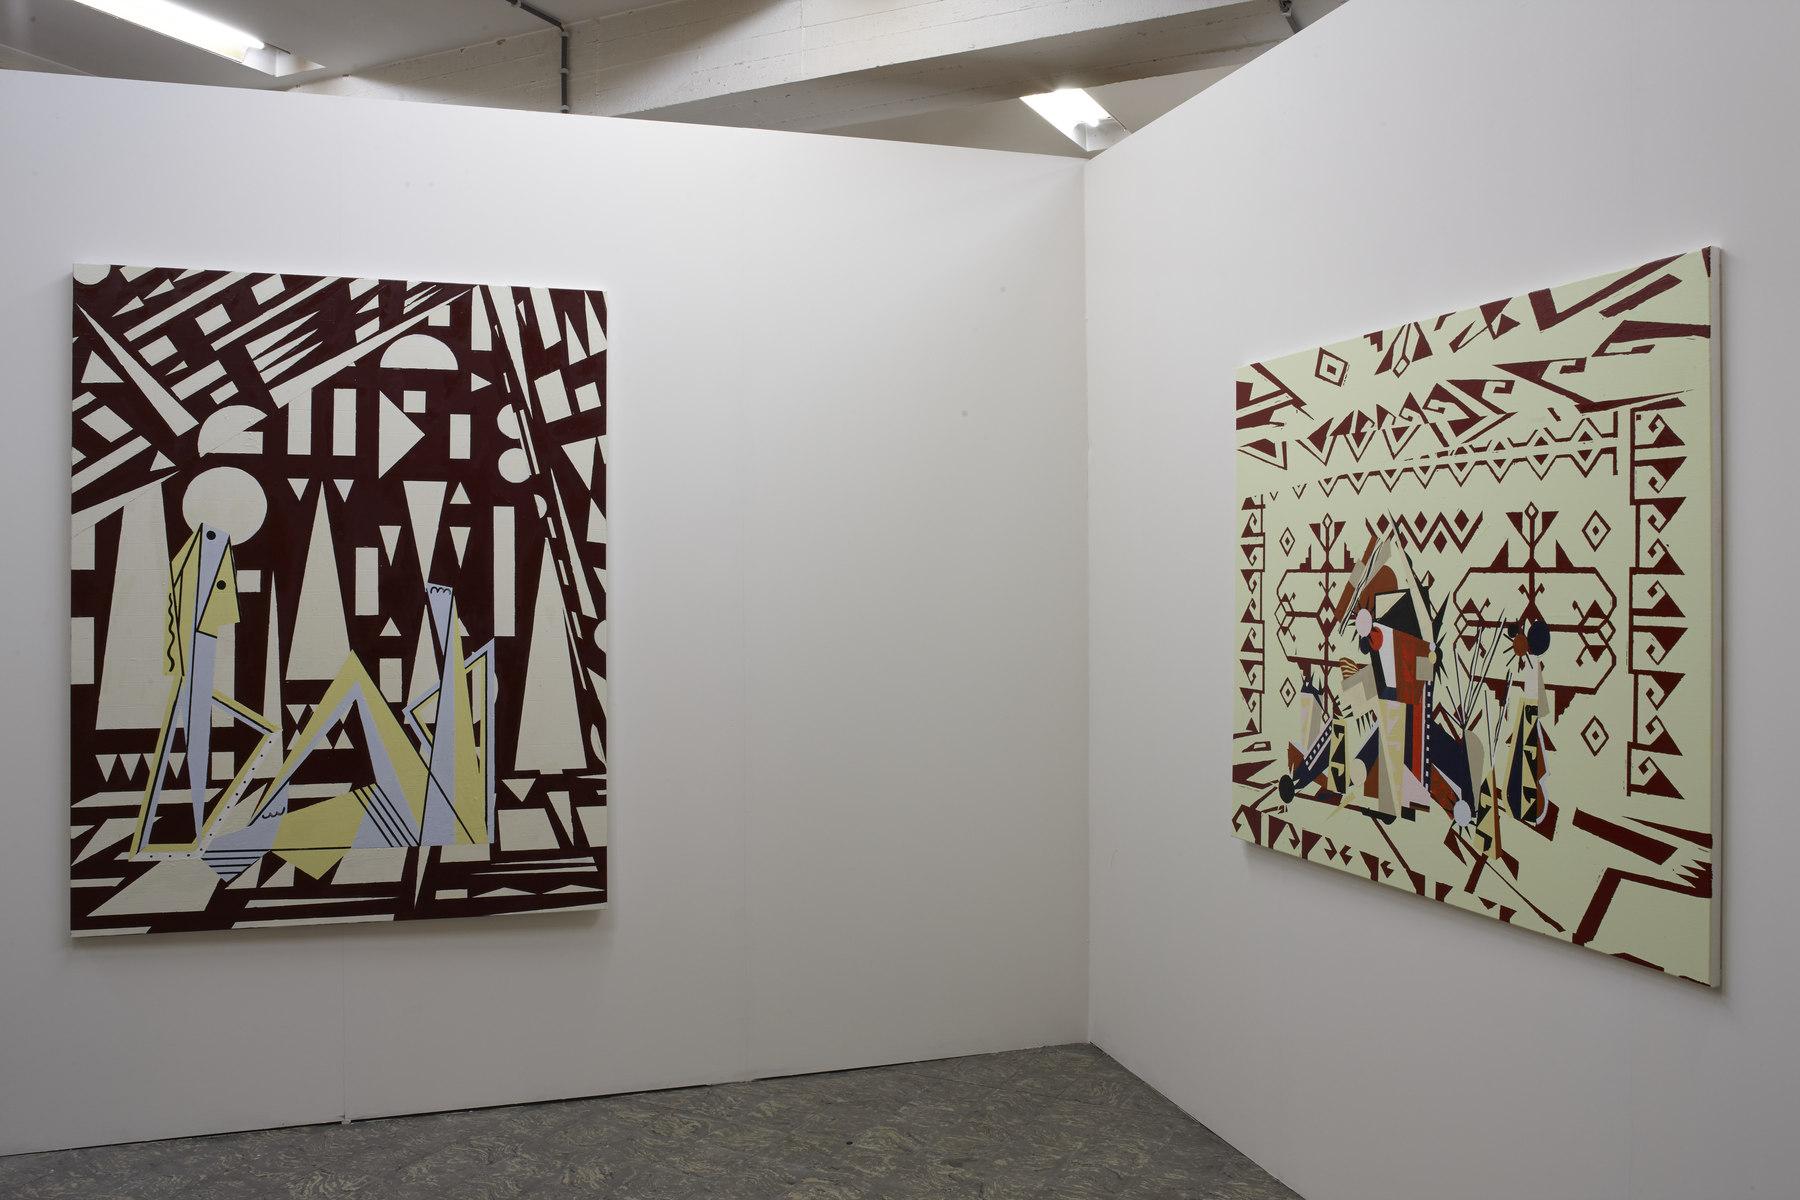 Farah Atassi, 'Interior with Flowers', 2015, 'Woman in a Studio', 2015, in 'Farah Atassi', installation view, Extra City Kunsthal, 2015 © Jan Kempenaers